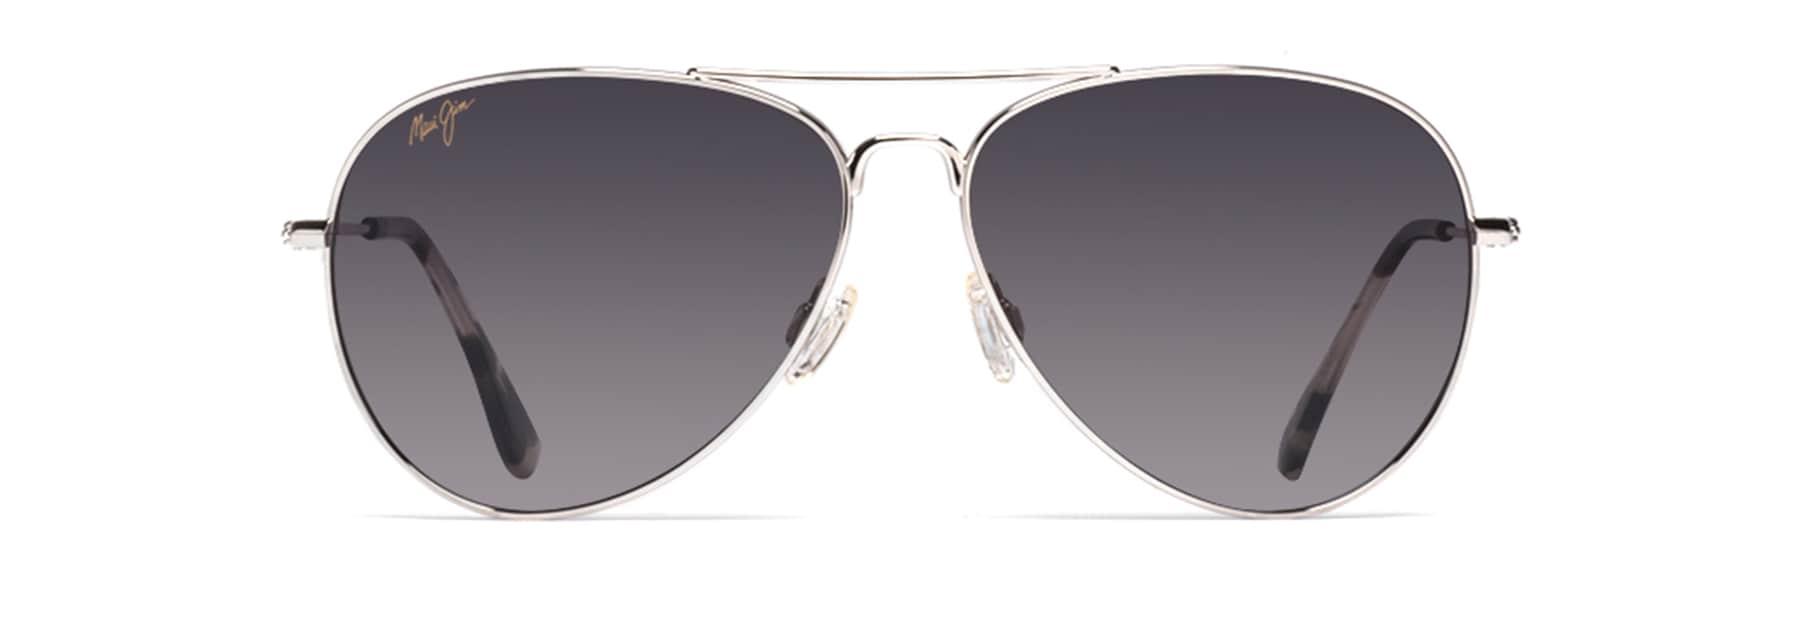 Mavericks Polarized Sunglasses  3d1ba6a482e4b